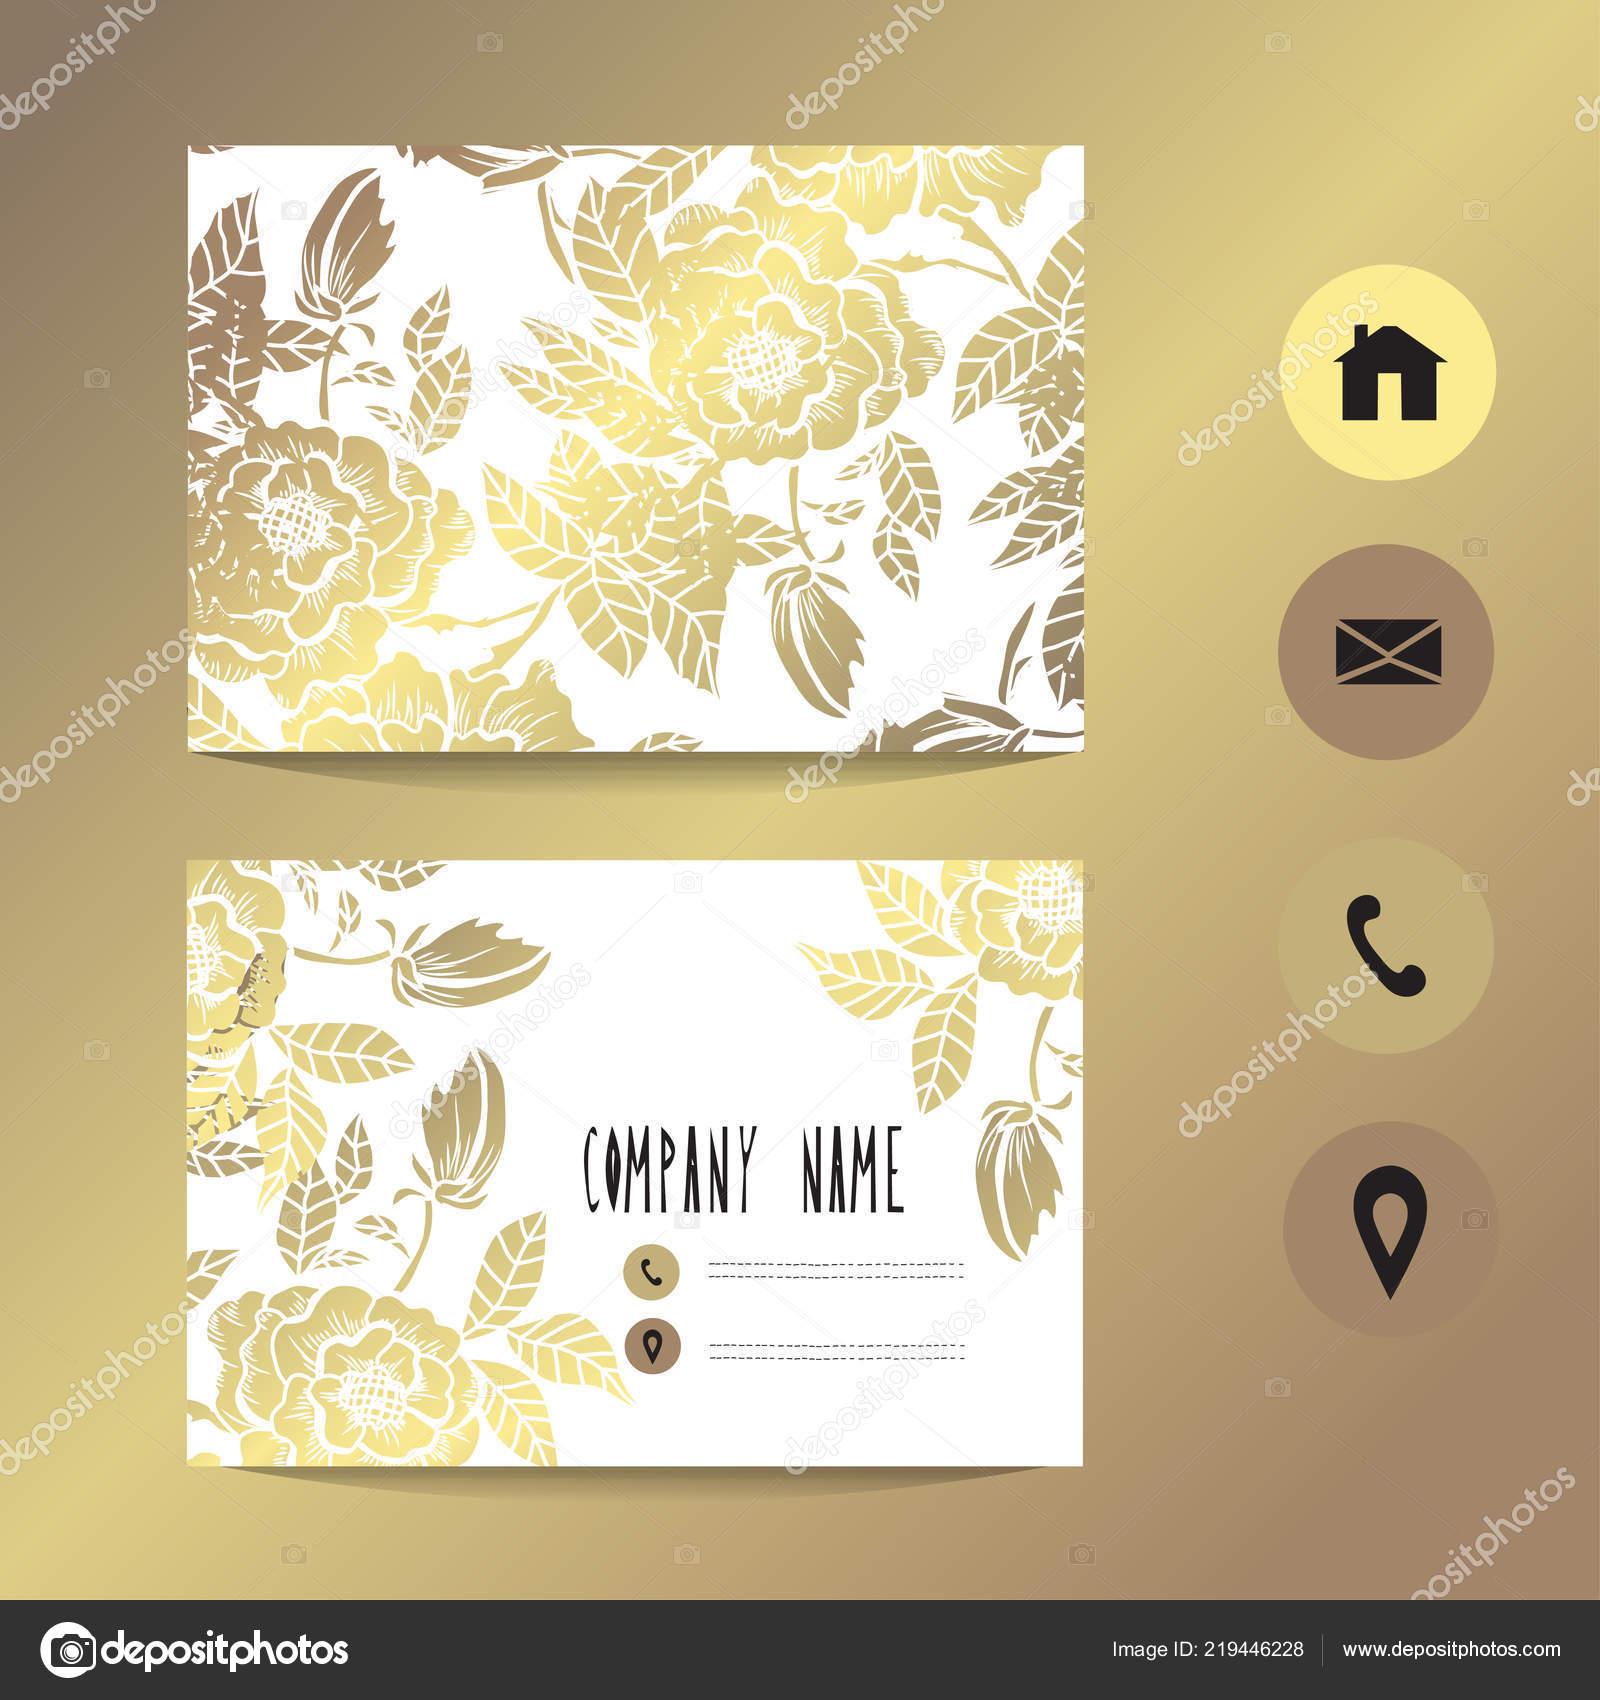 Visitenkarte Vorlage Mit Goldenen Pfingstrosen Design